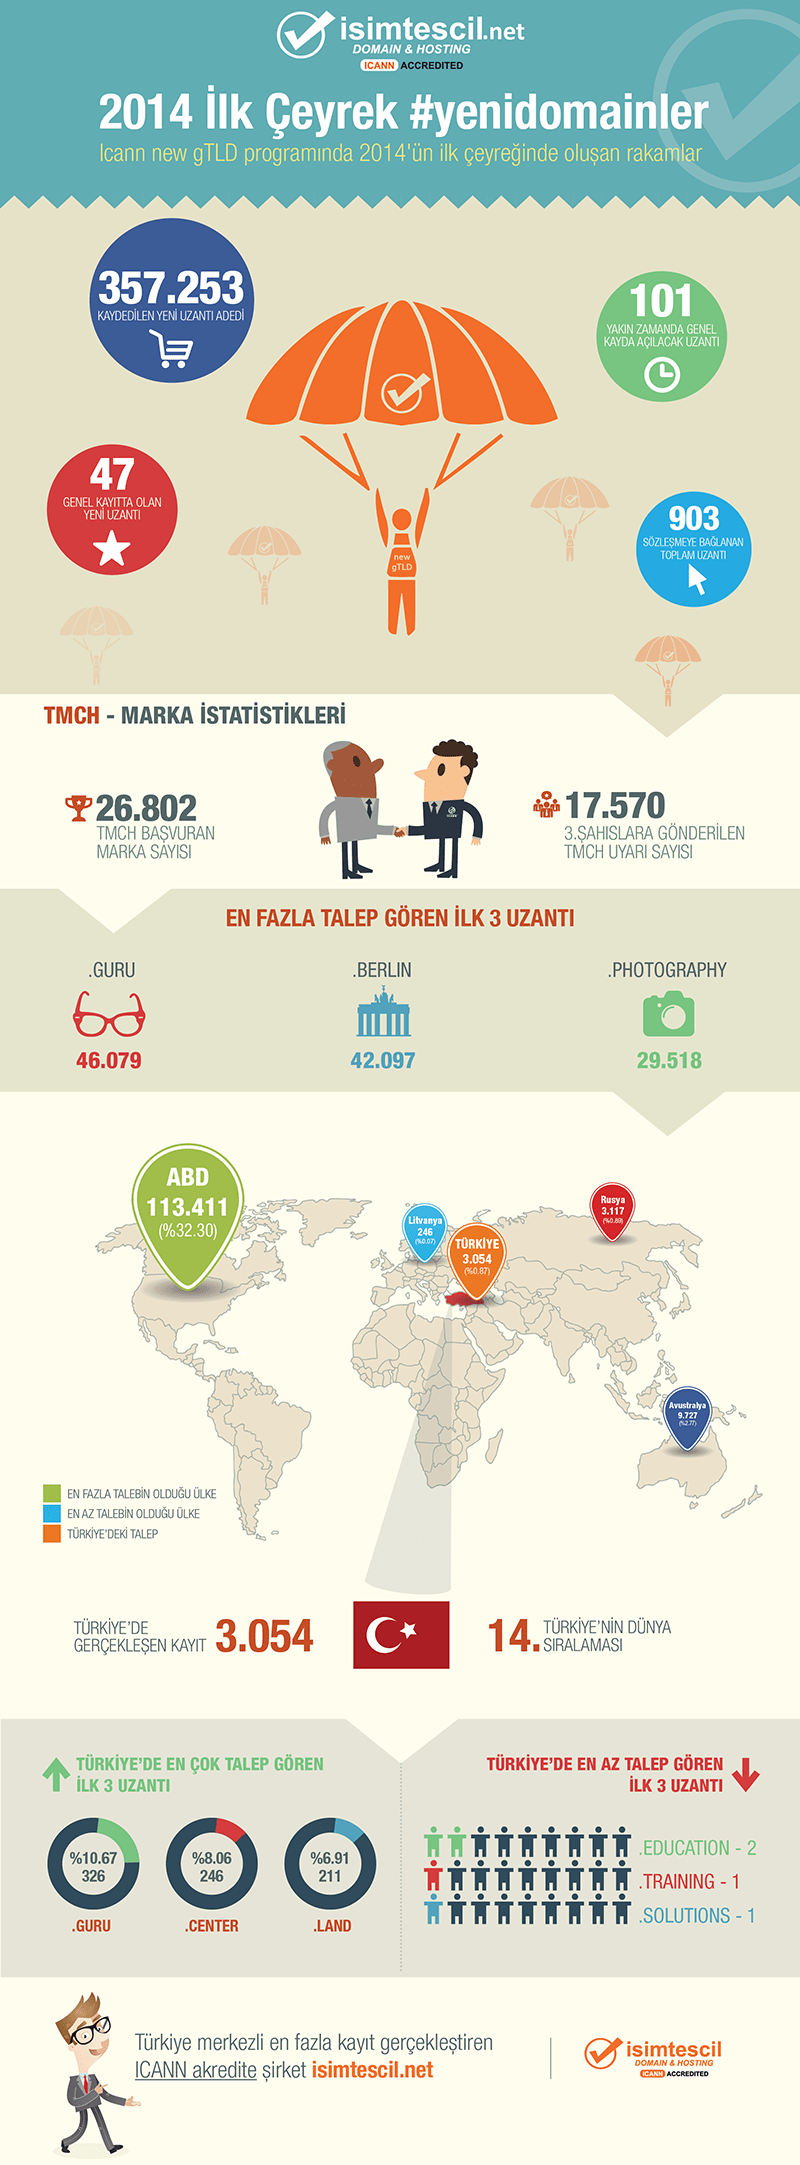 infografik-yeni-domain-kayitlari